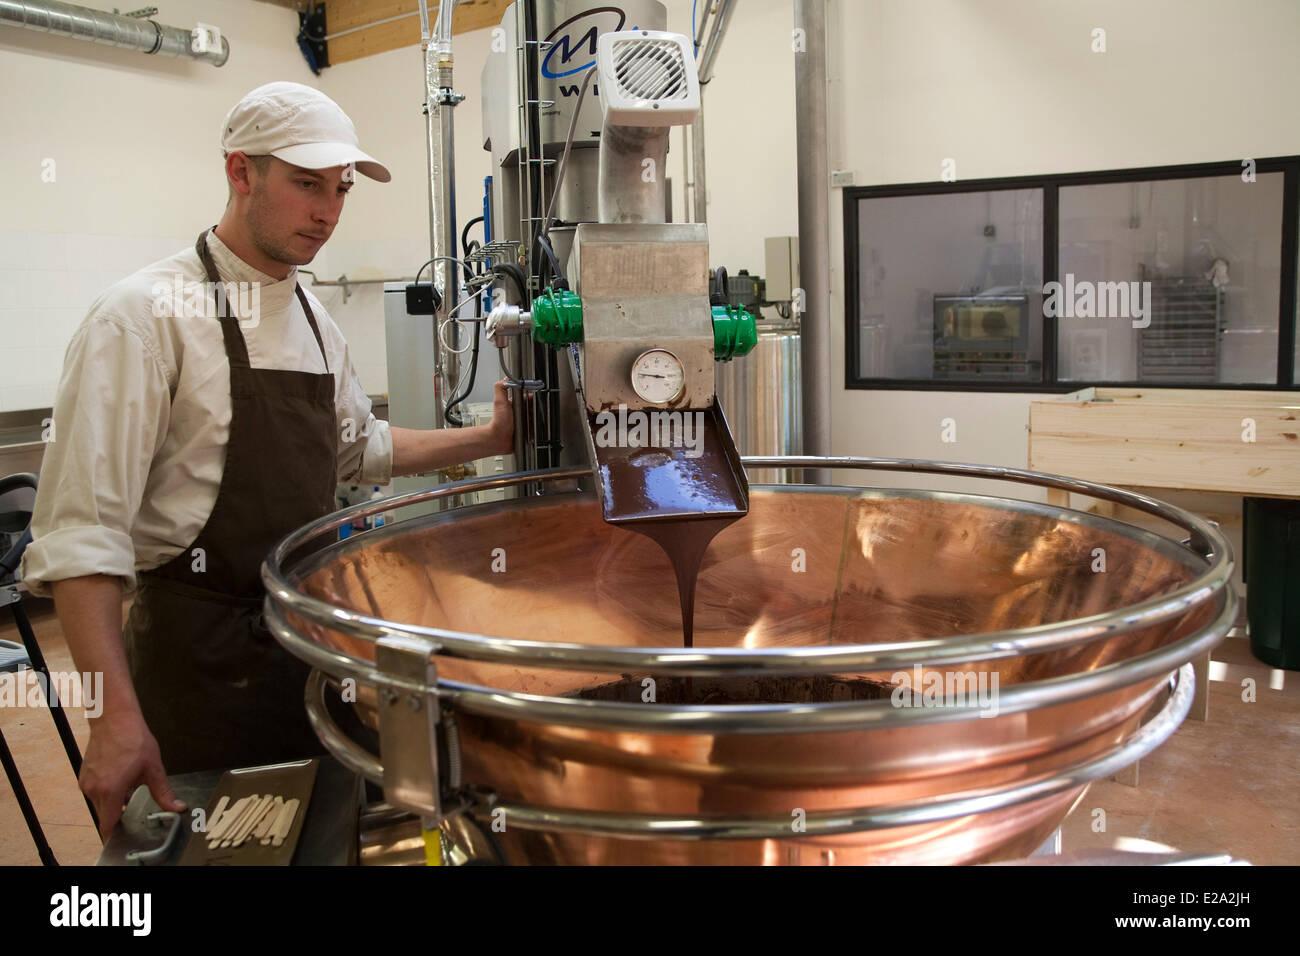 Chocolate Maker Stock Photos & Chocolate Maker Stock Images - Alamy